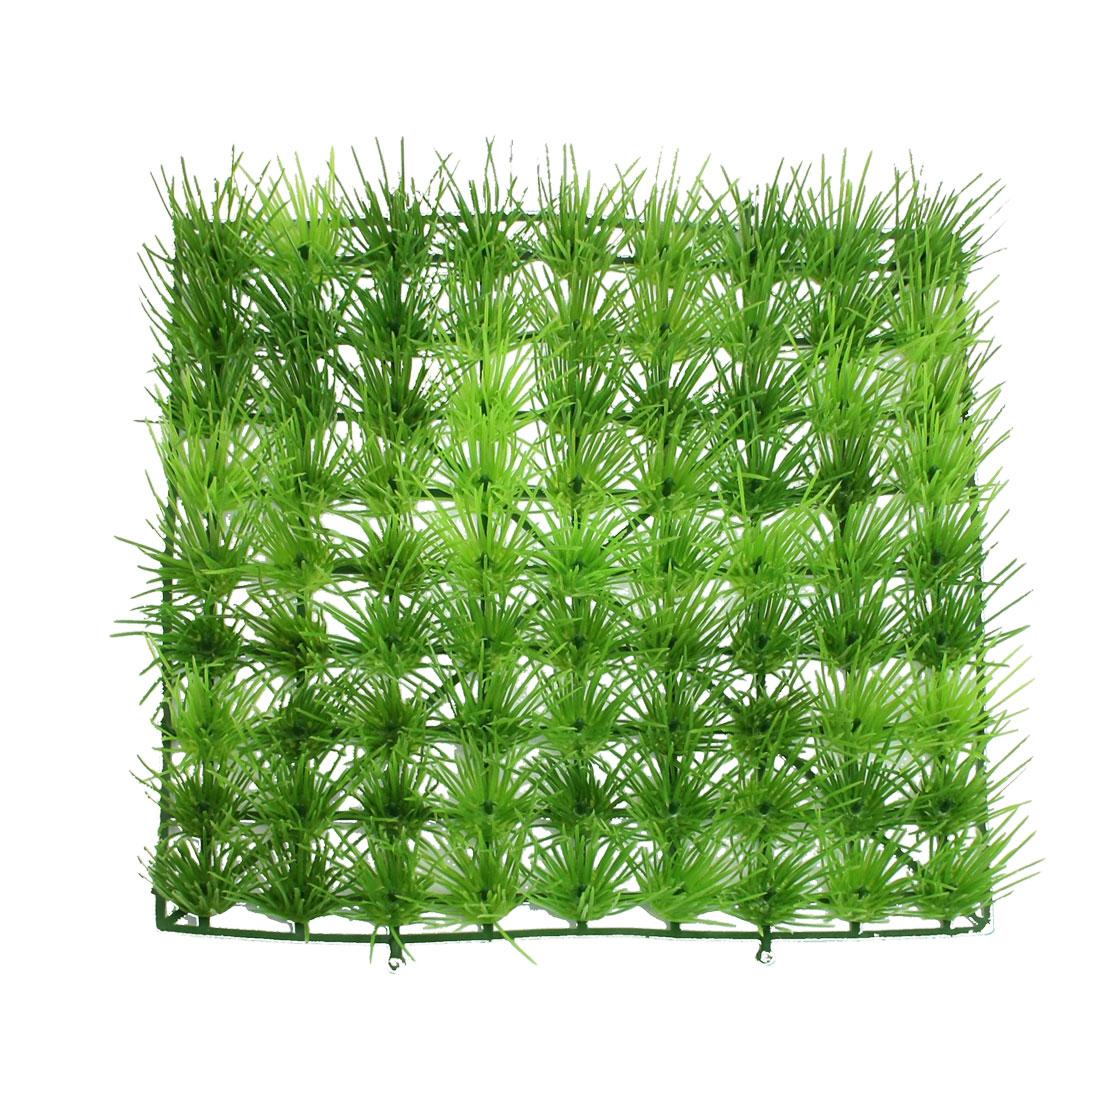 "9.1"" x 9.1"" Emulational Green Plastic Lawn Grass for Aquarium Fish Tank"